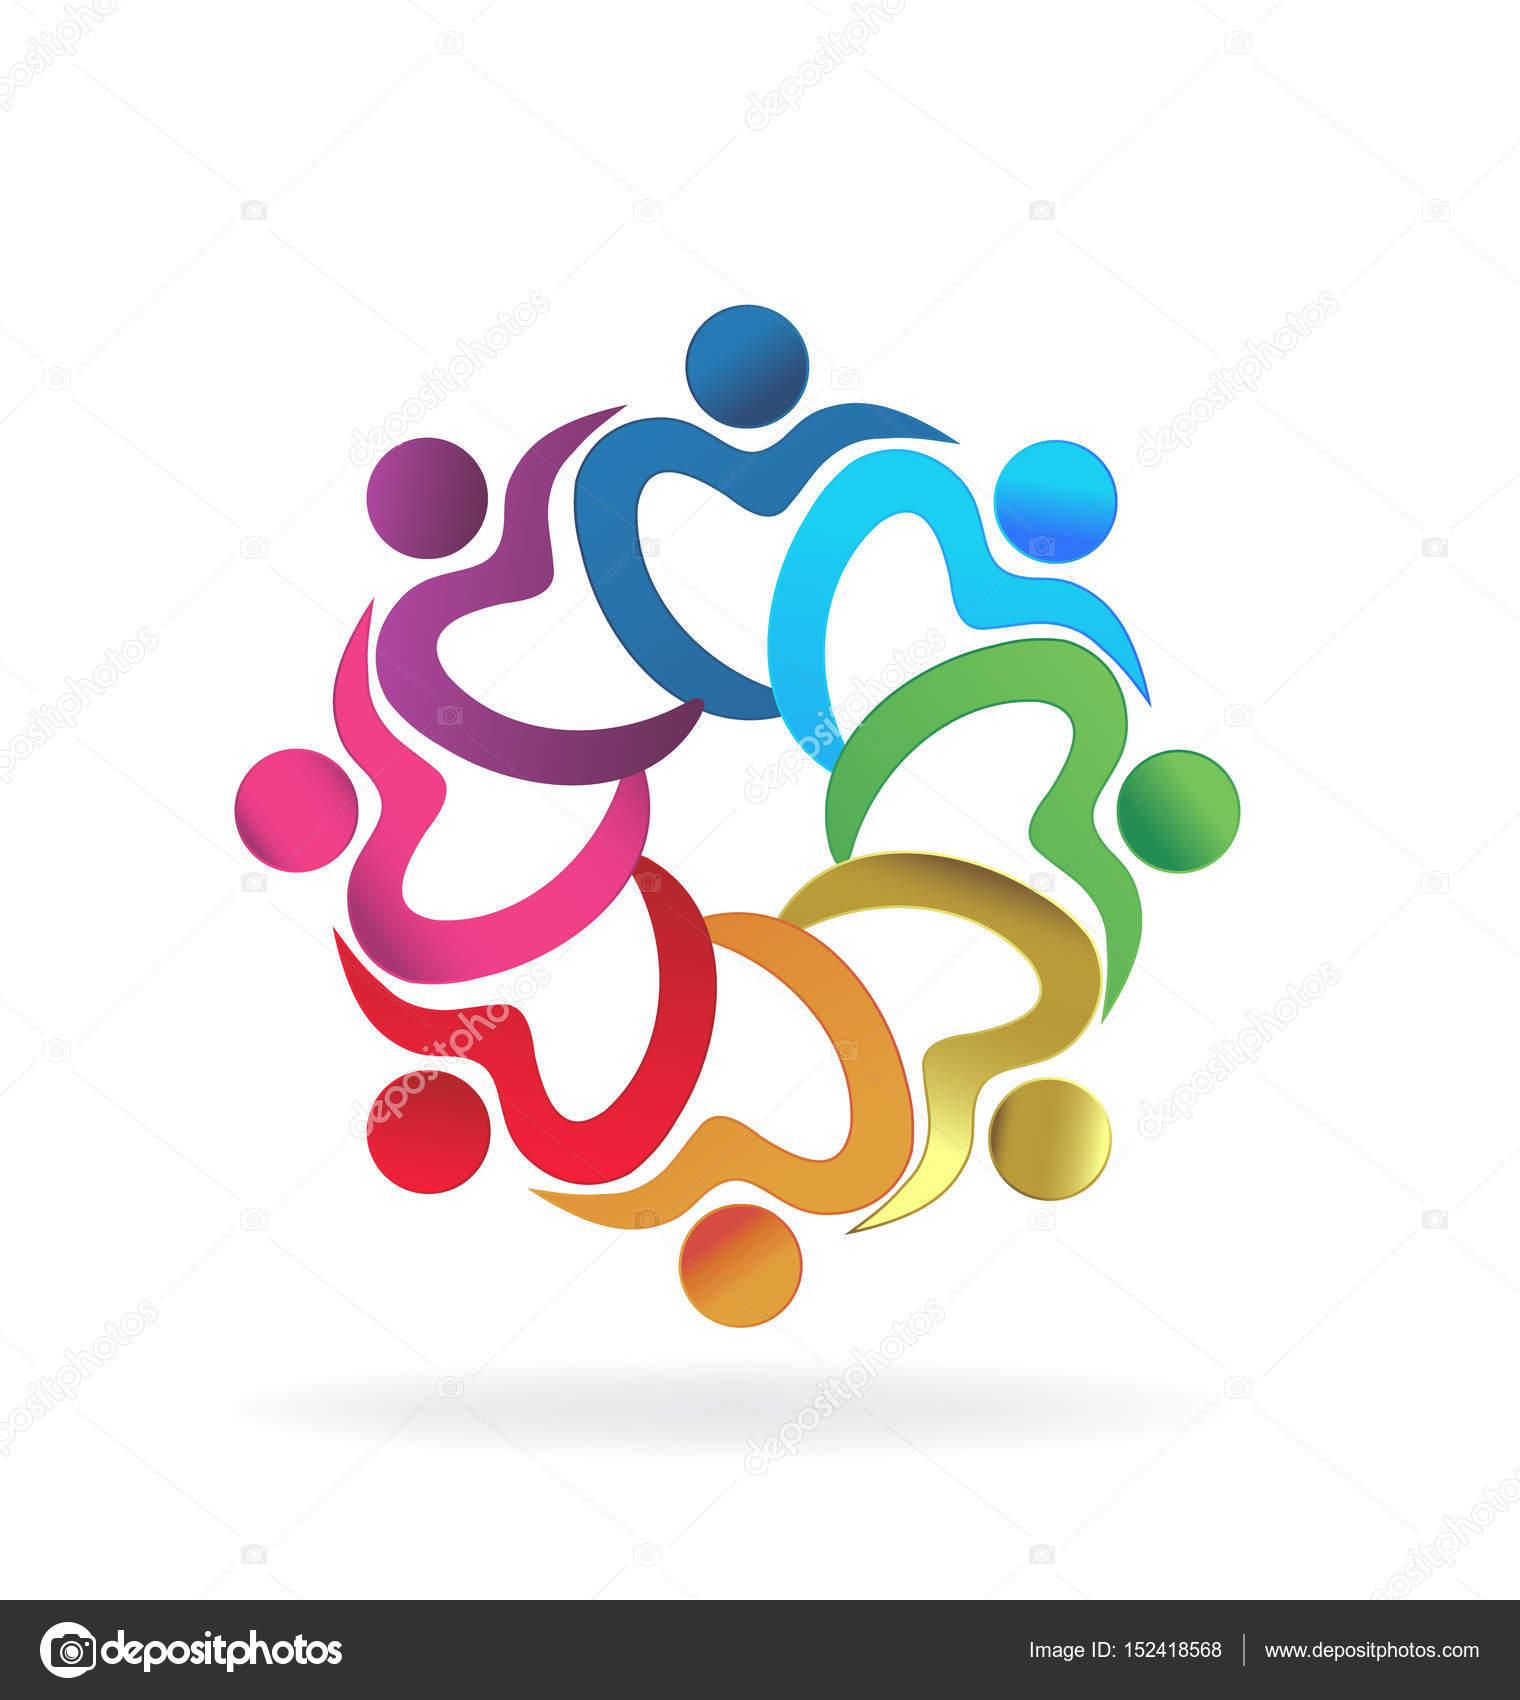 Logo-Teamarbeit-Herzensliebe — Stockvektor © Glopphy #152418568